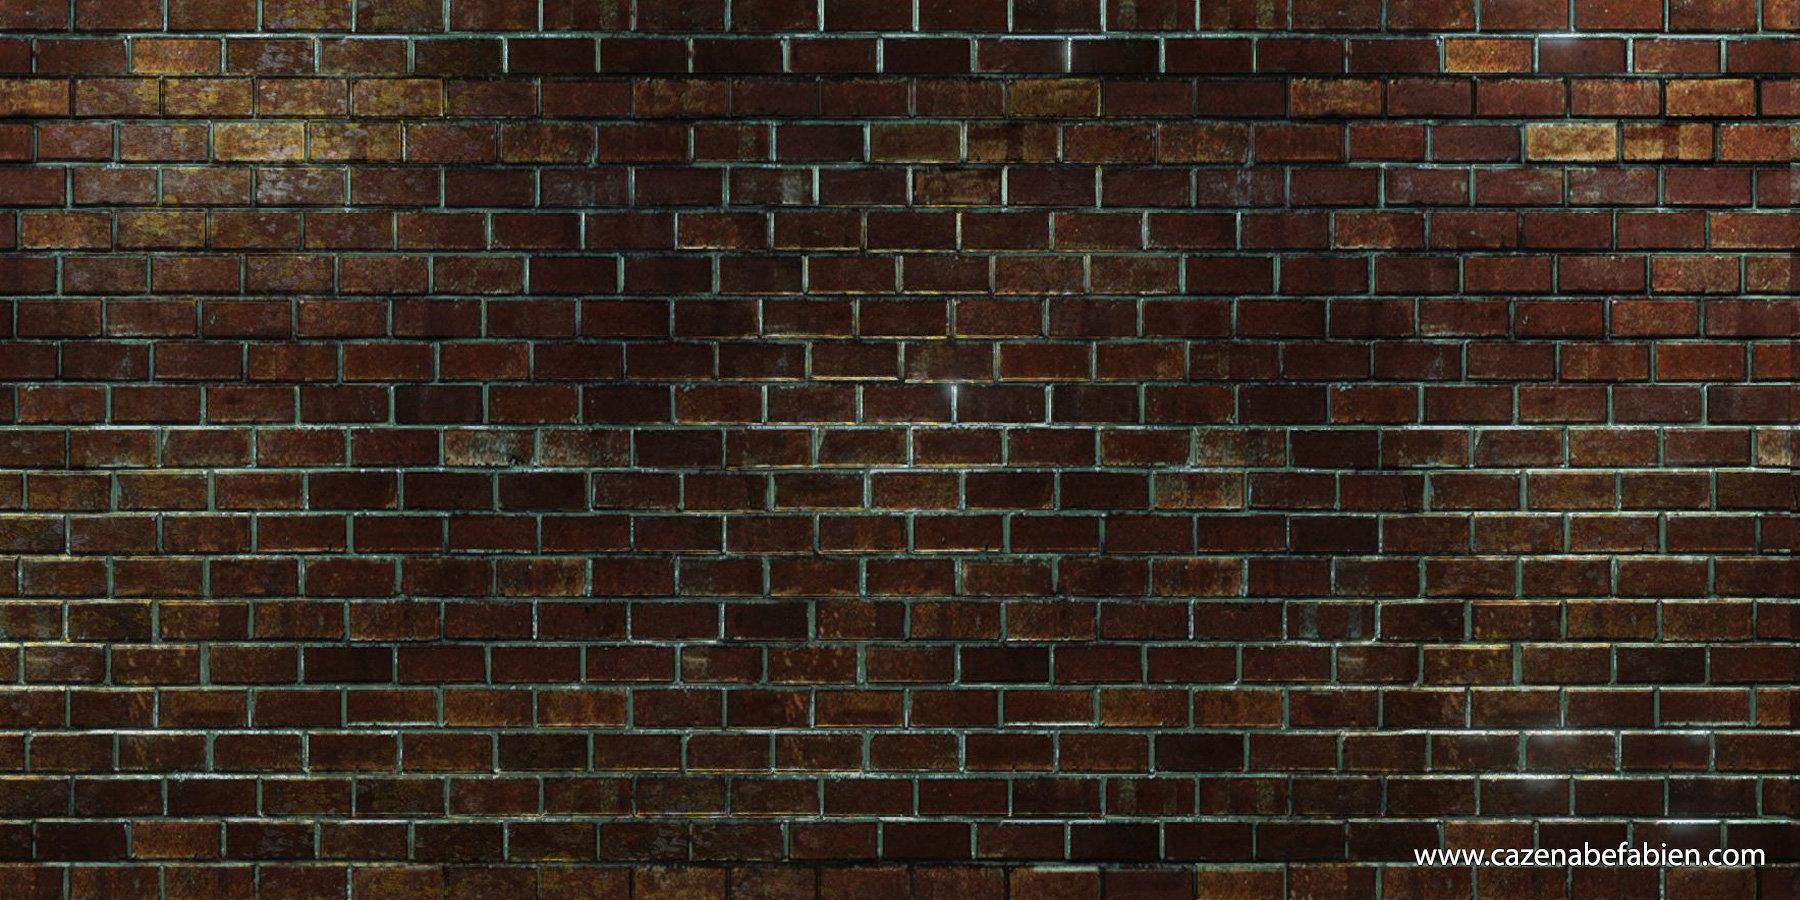 Fabien cazenabe brick 03